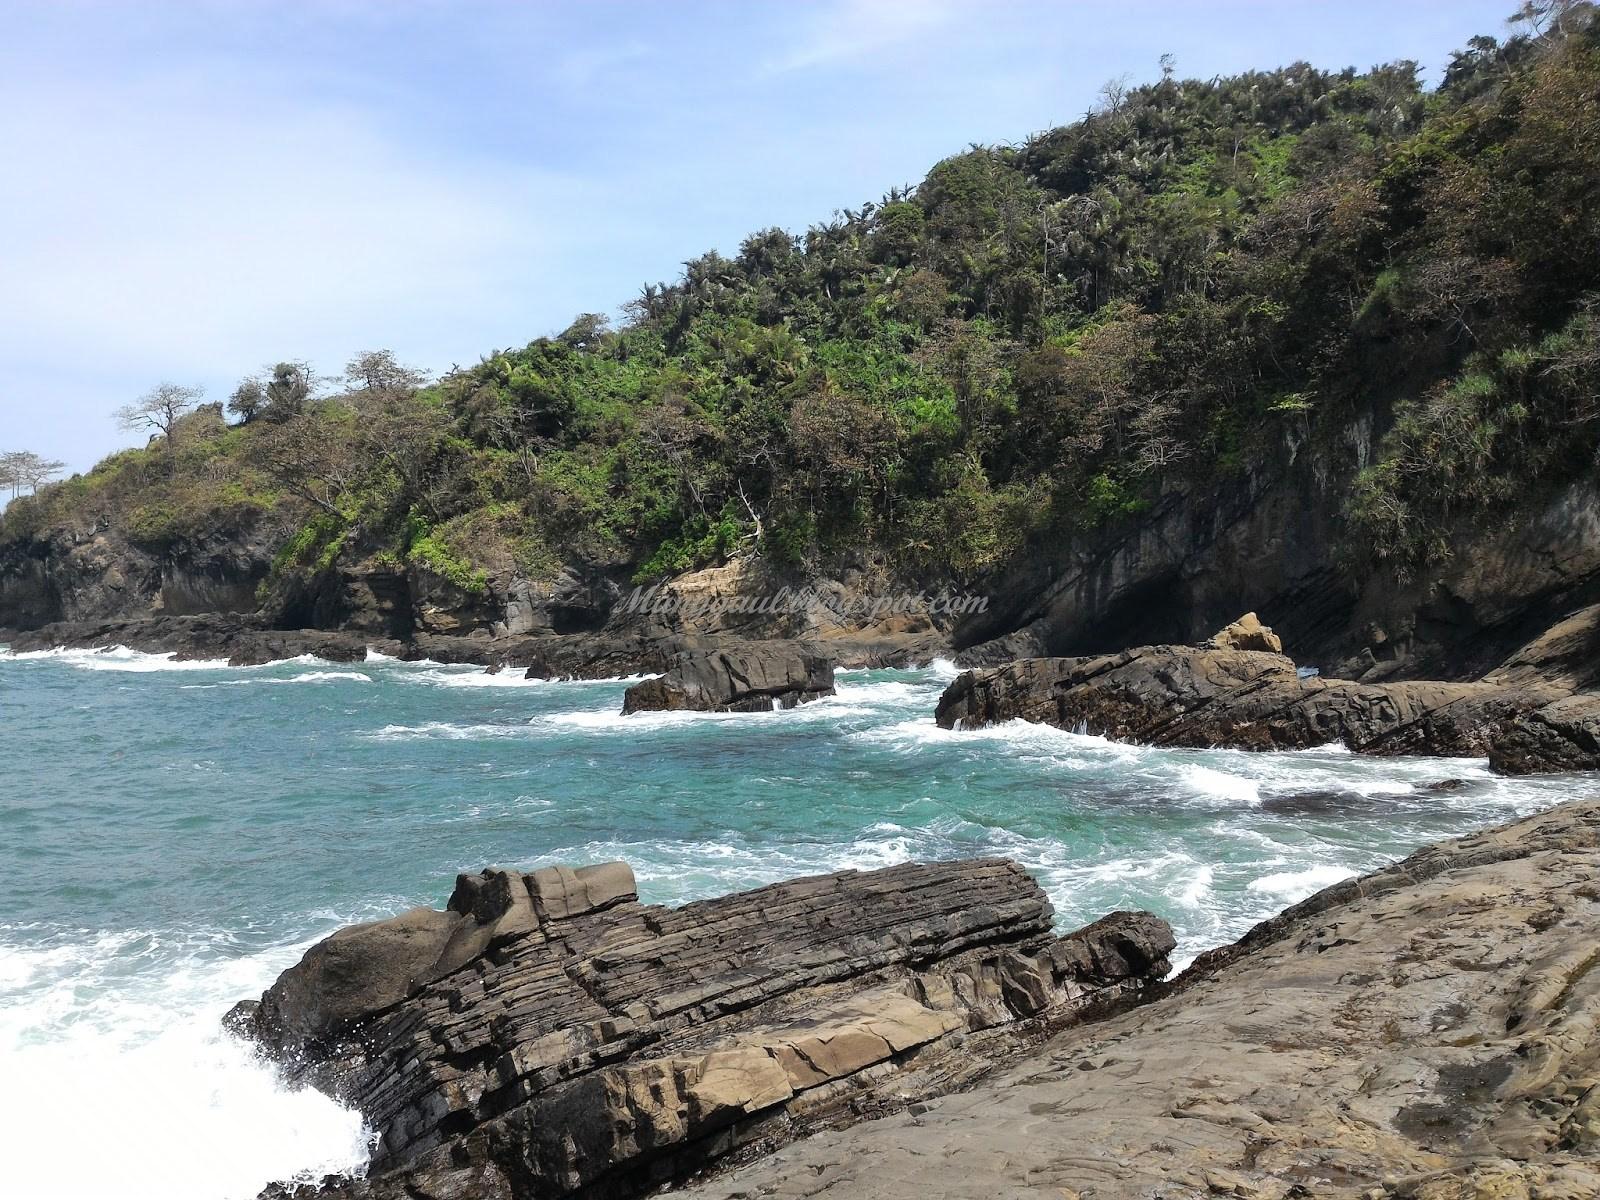 Sewa Bus Parawisata Destinasi Kabupaten Cilacap Besar Full Pantai Widarapayung